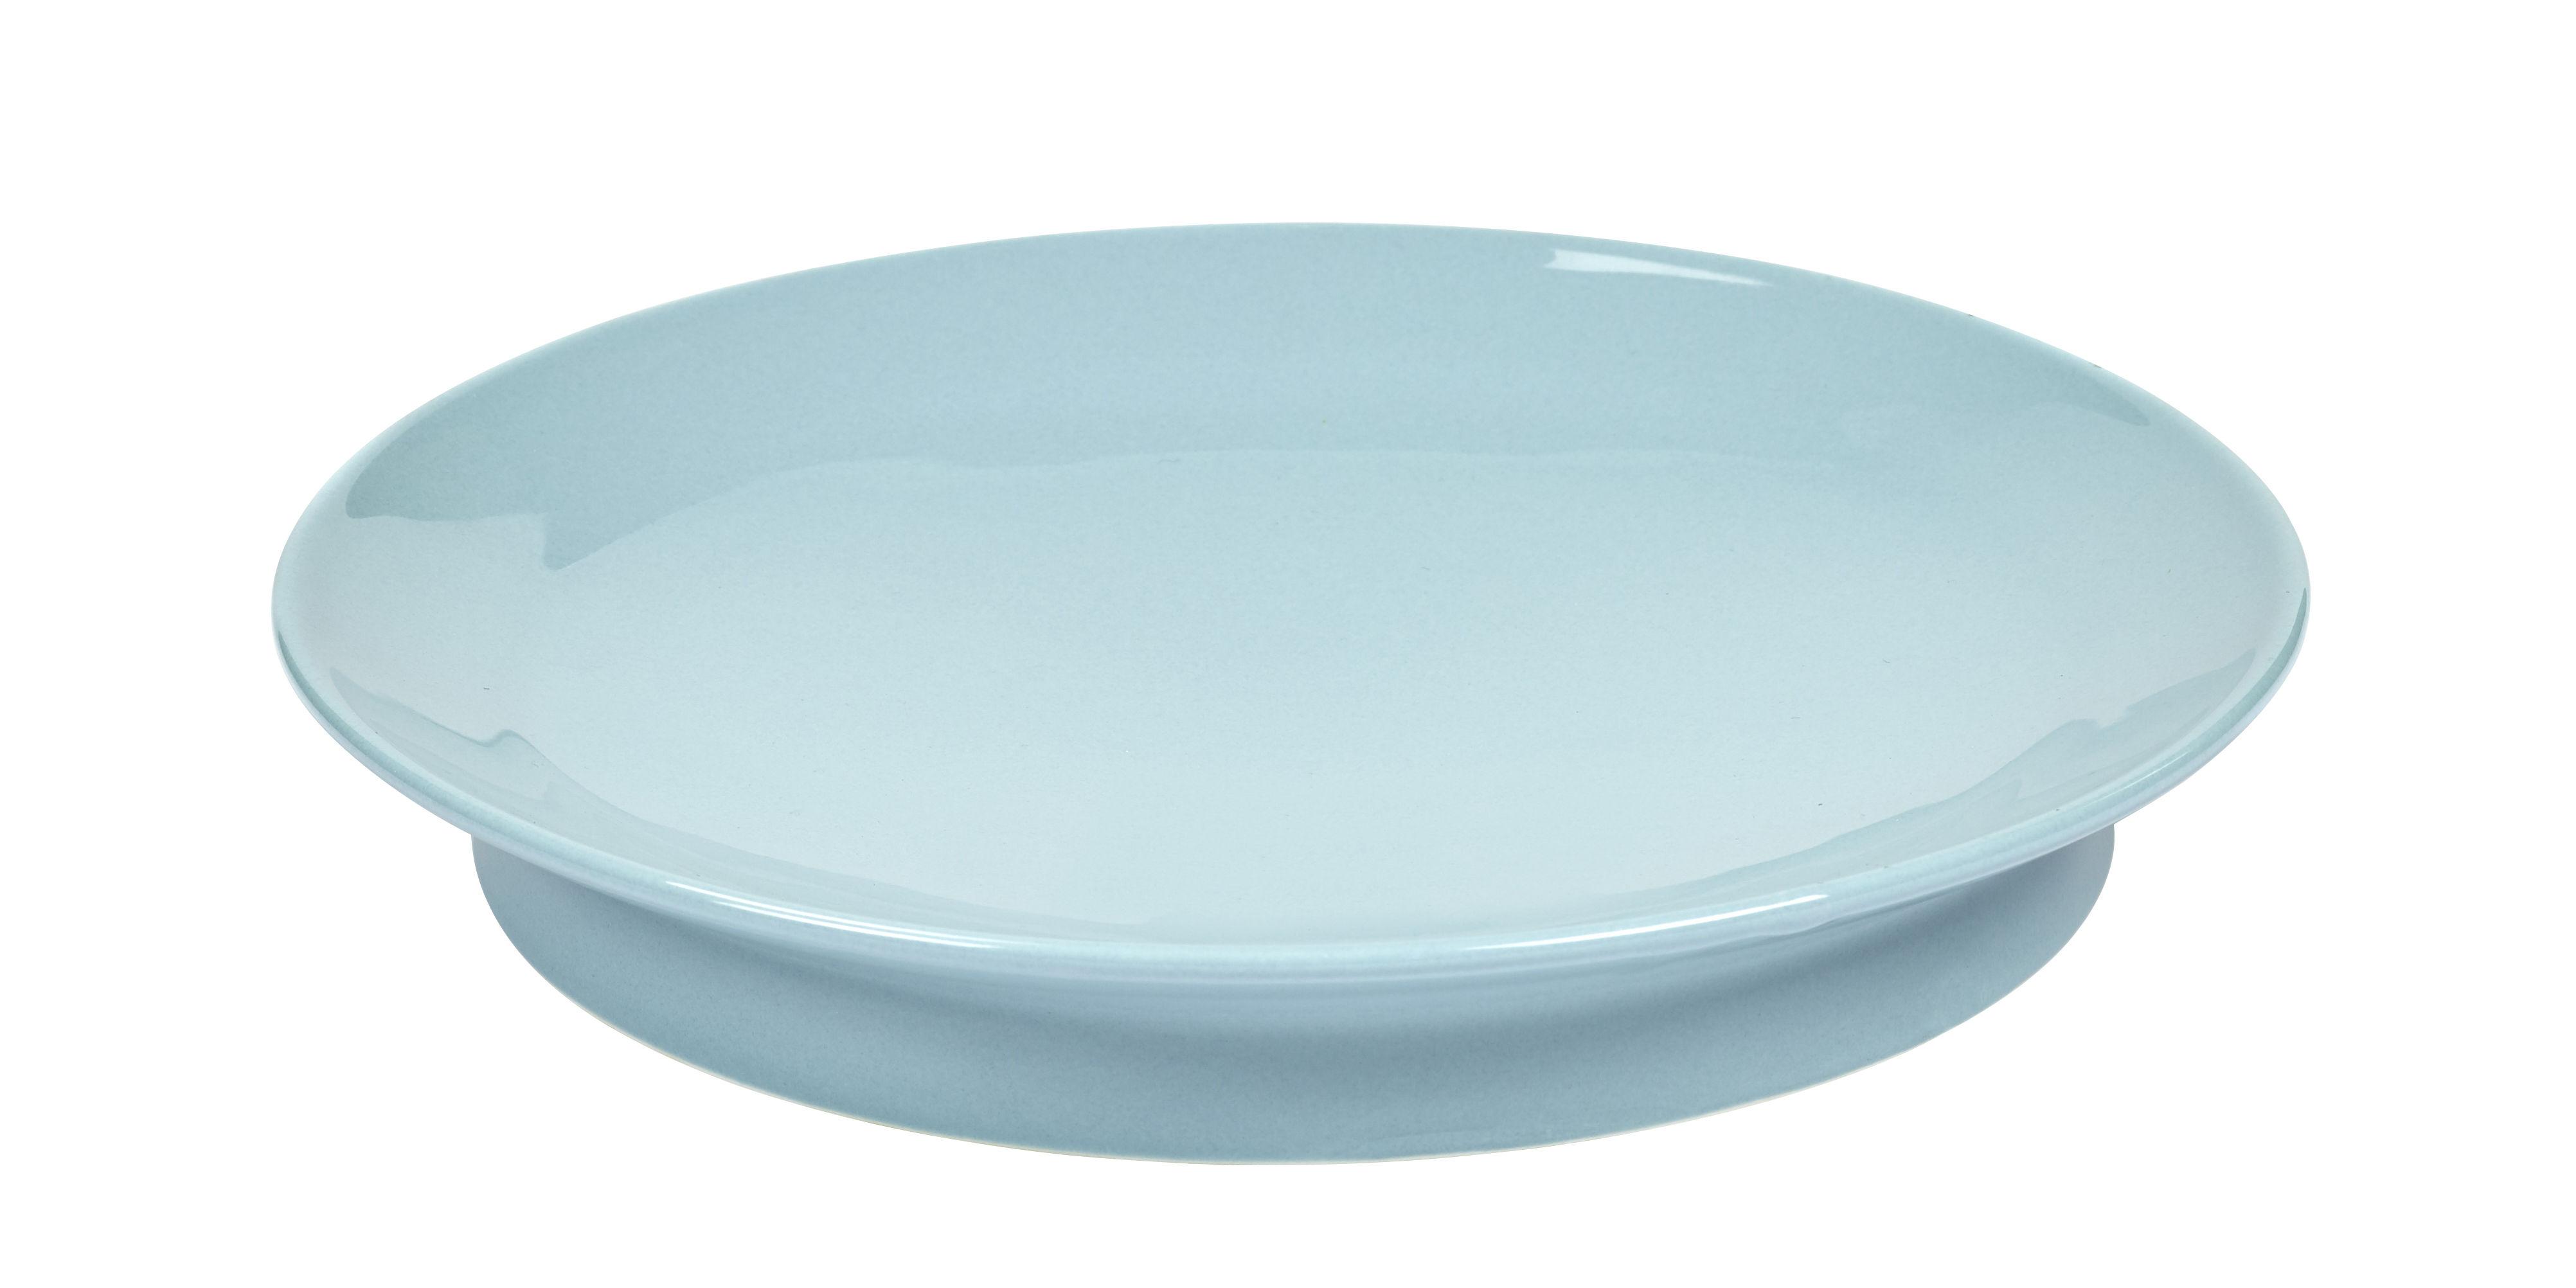 Tischkultur - Teller - San Pellegrino Teller / Ø 24 cm - Serax - Blau - Porzellan